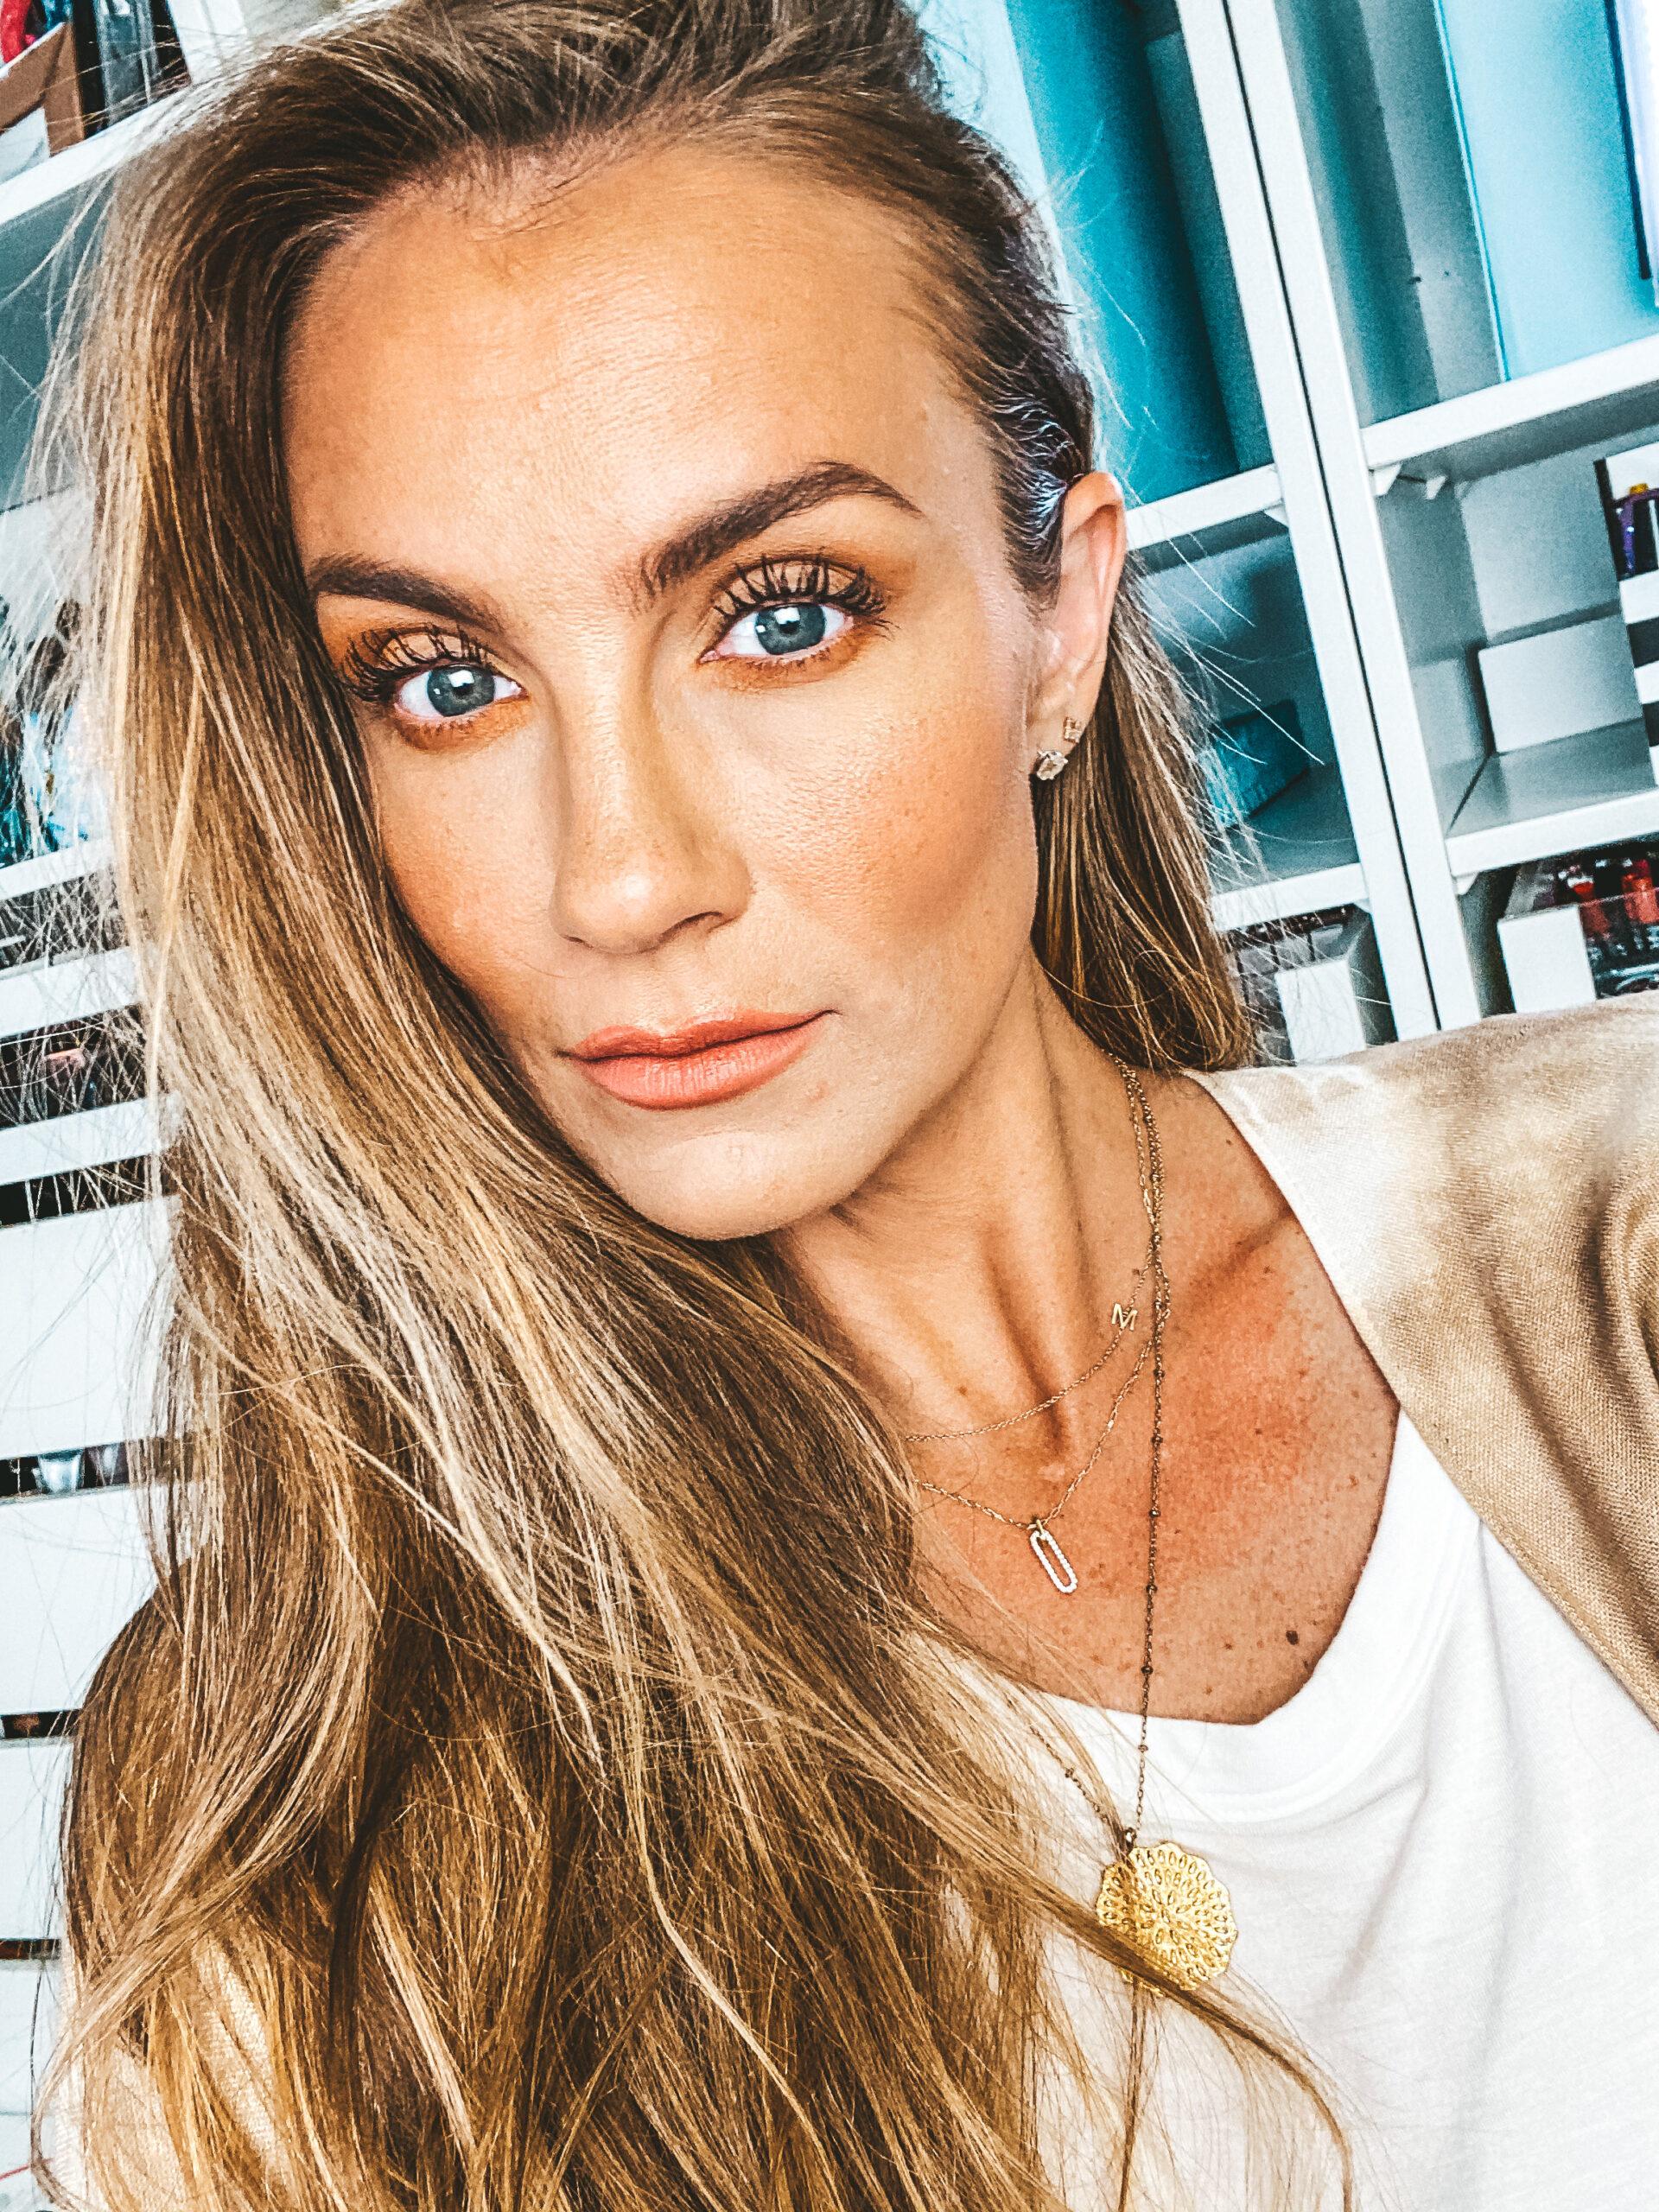 Full Face using ONLY Walmart Makeup